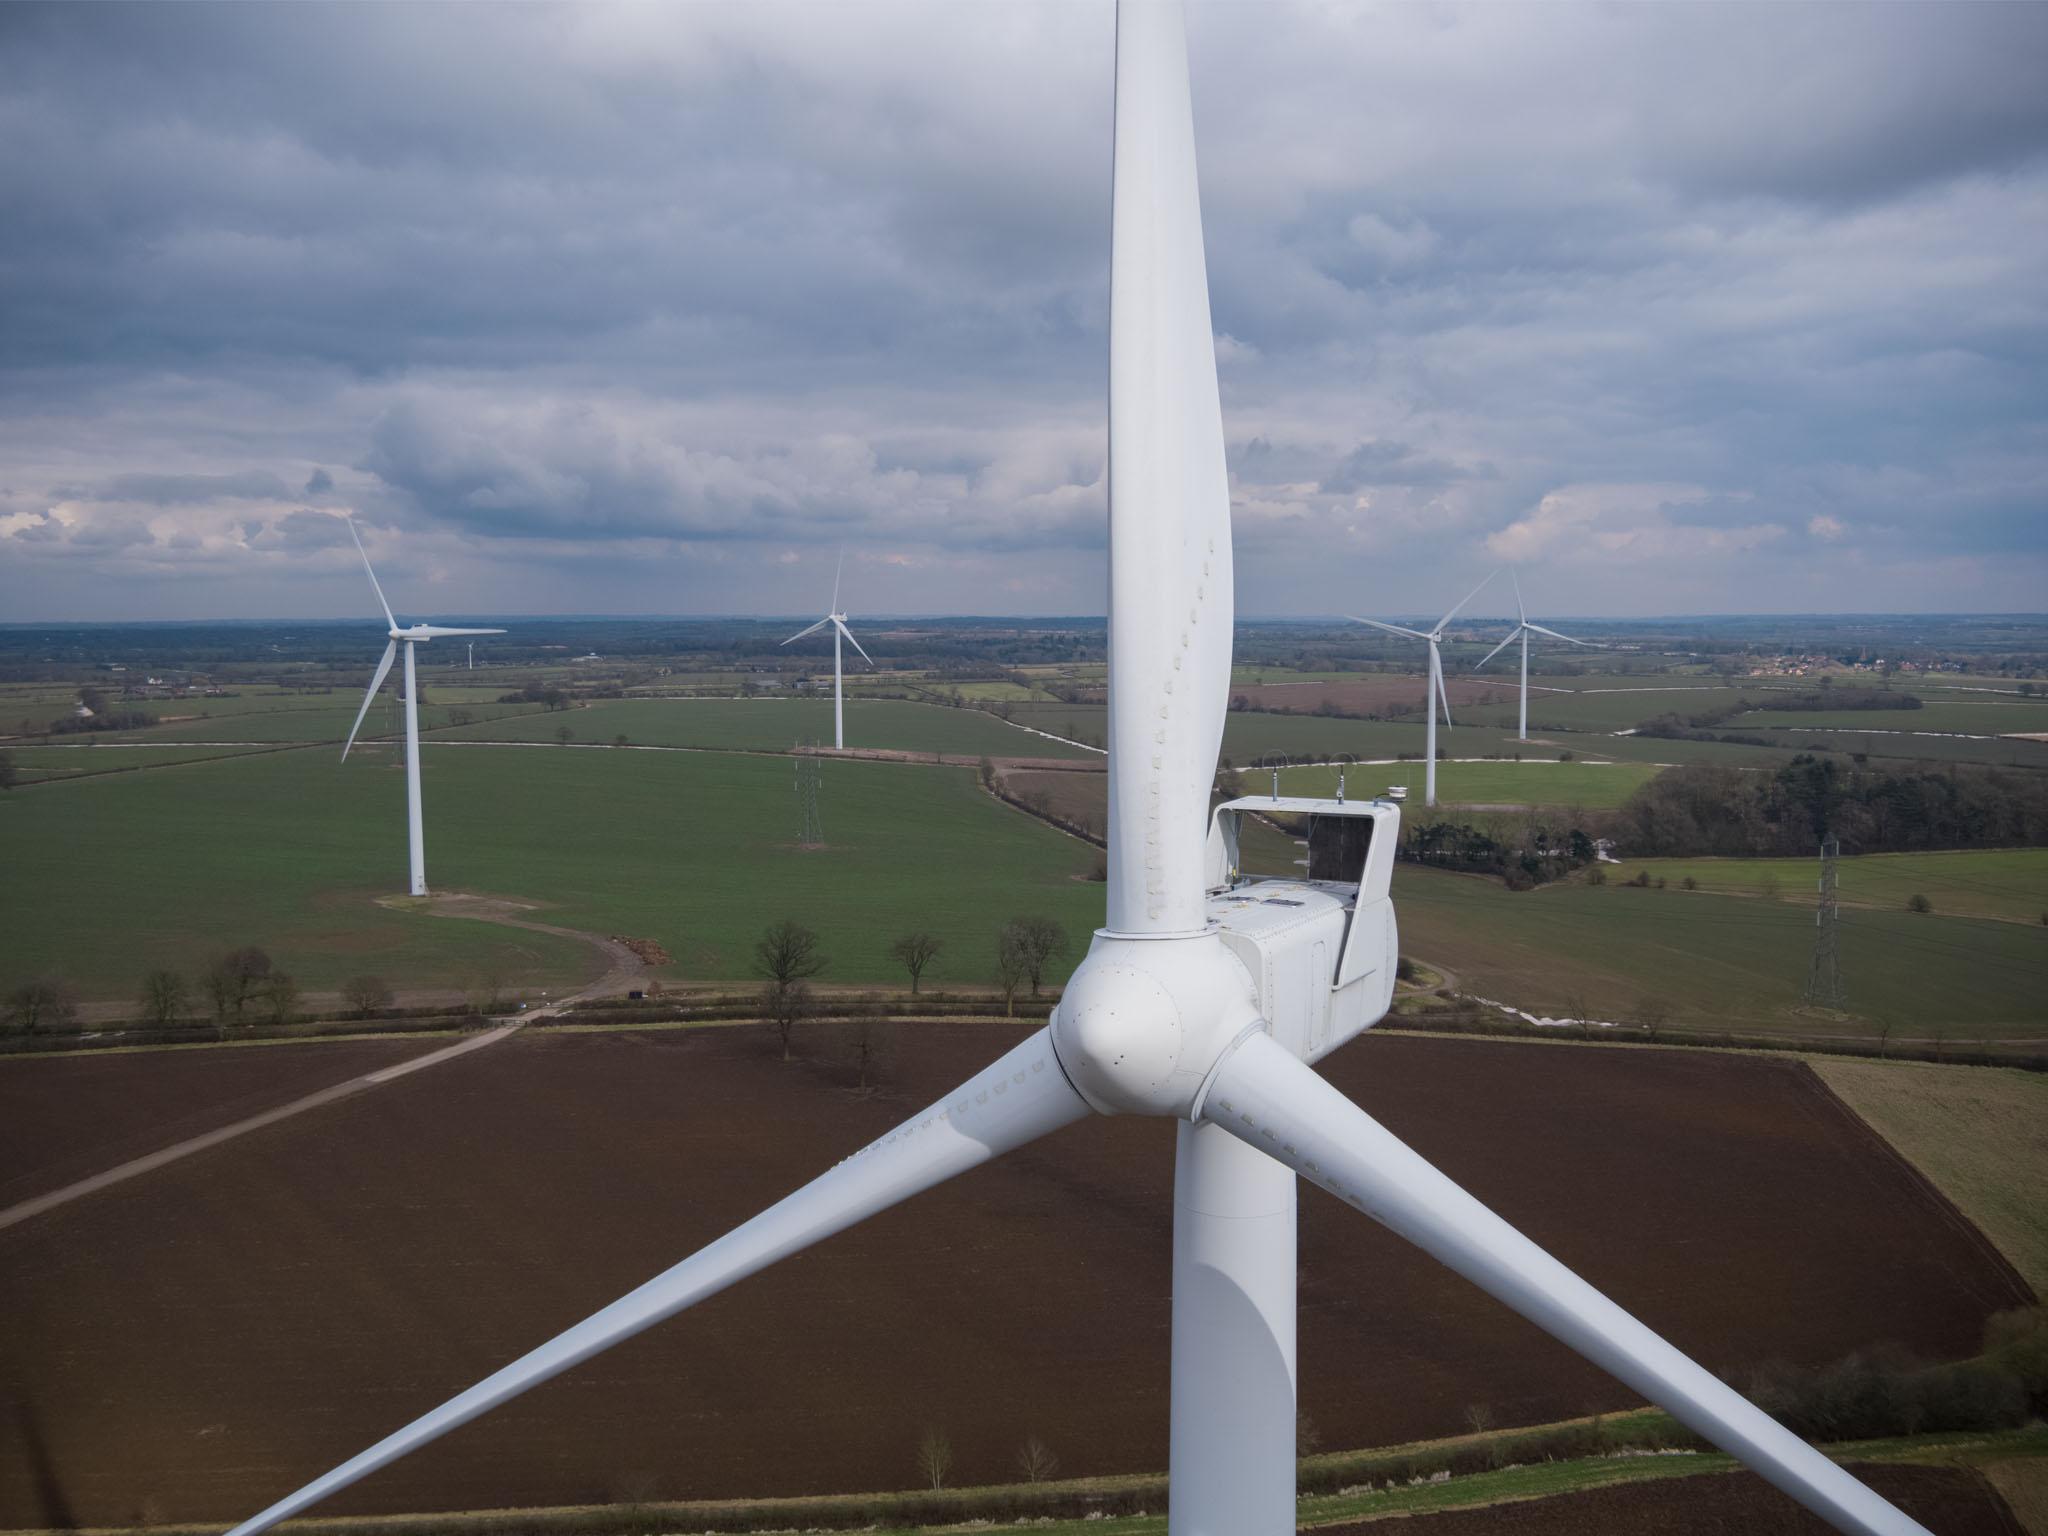 Wind turbine inspection using drone video